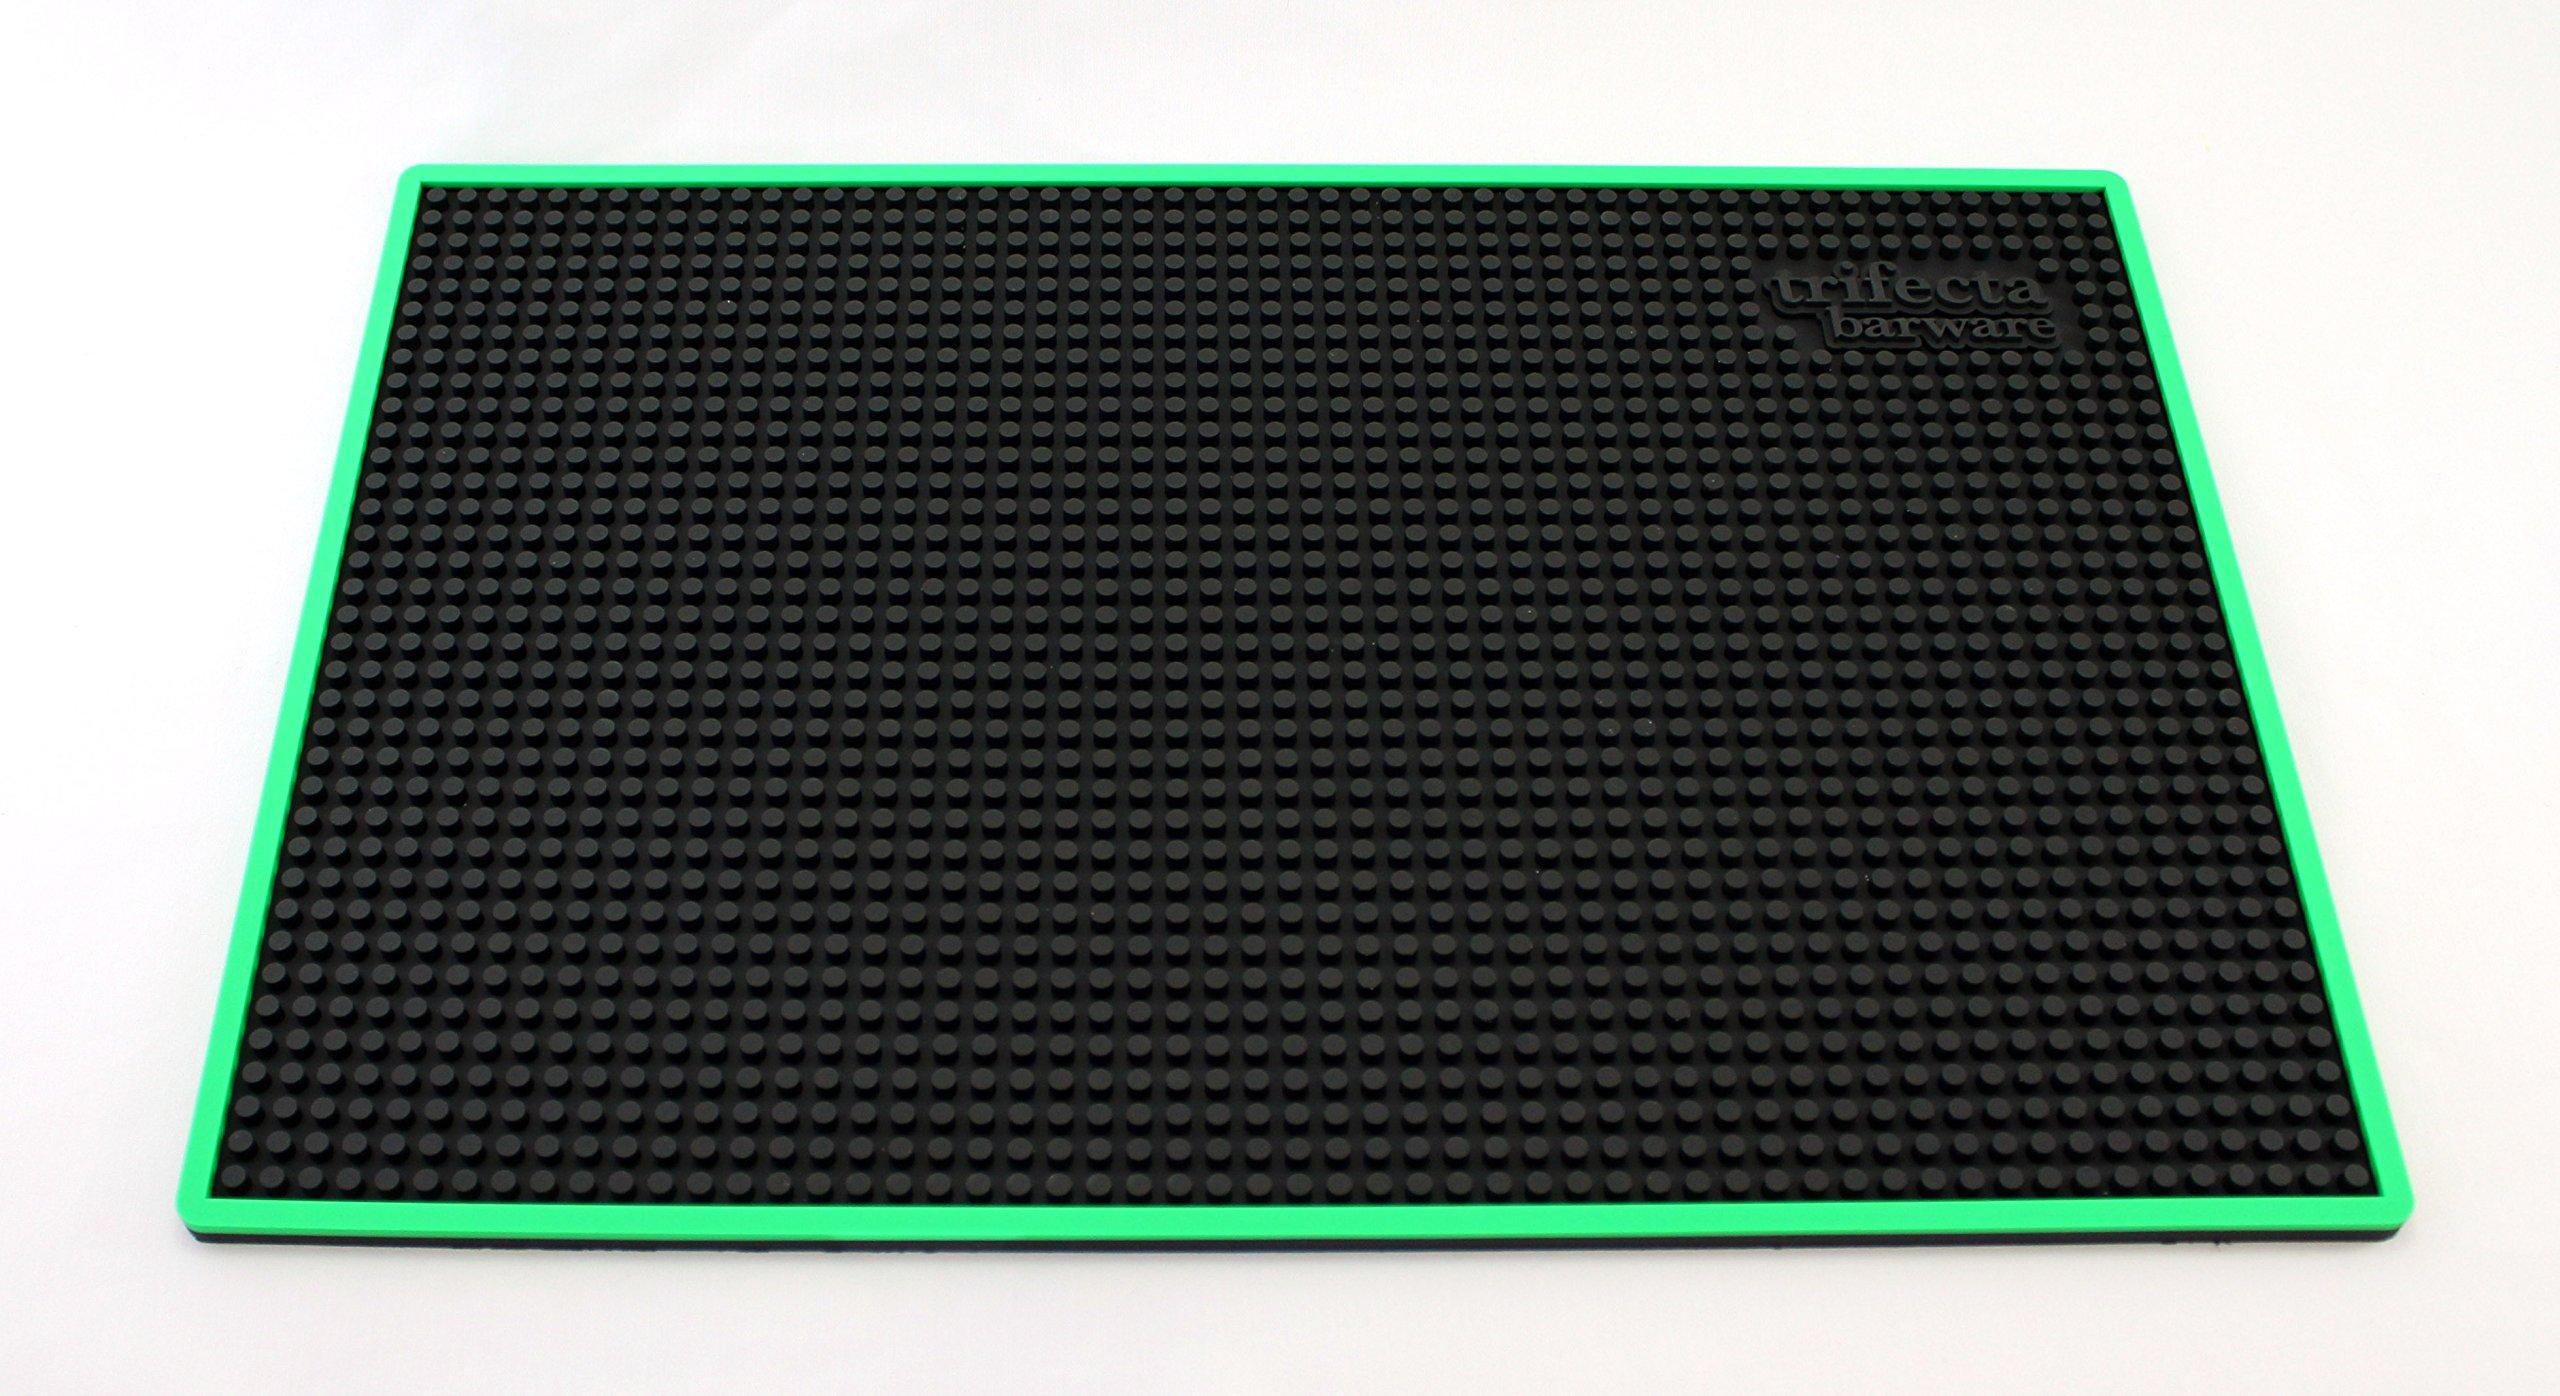 Trifecta Barware 18 X 12 Inch Bar Mat | Service and Spill Mat | Black with Green Edge